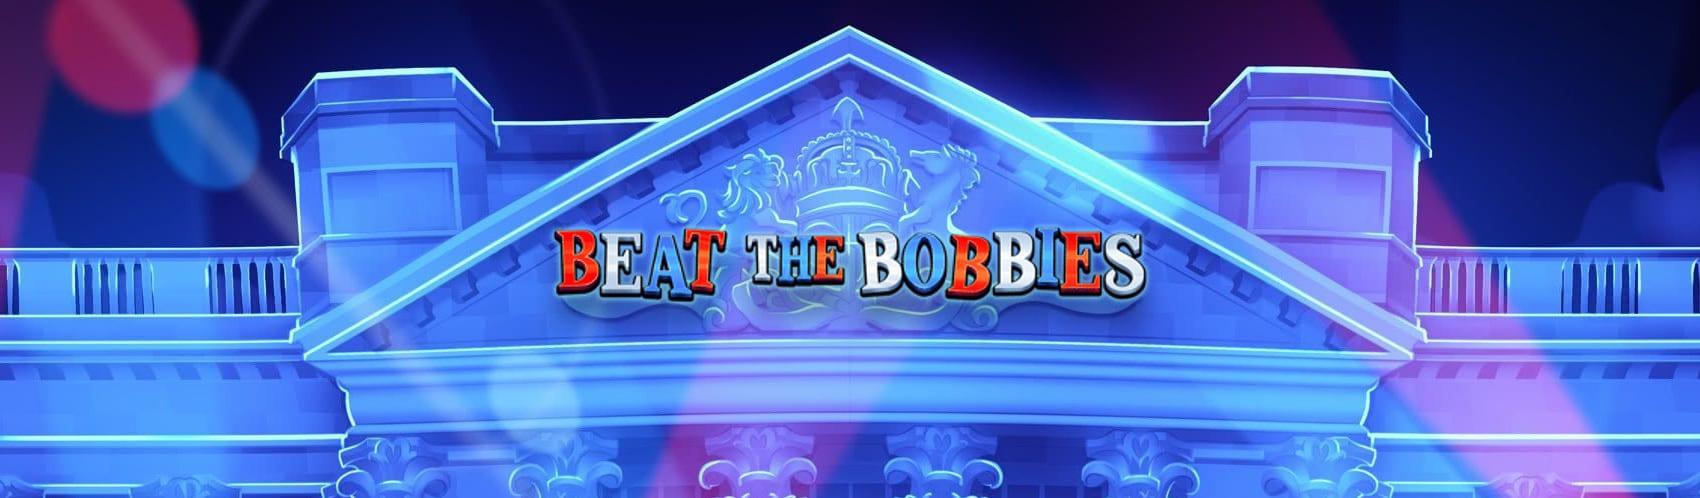 beat-the-bobbies - wizard slots